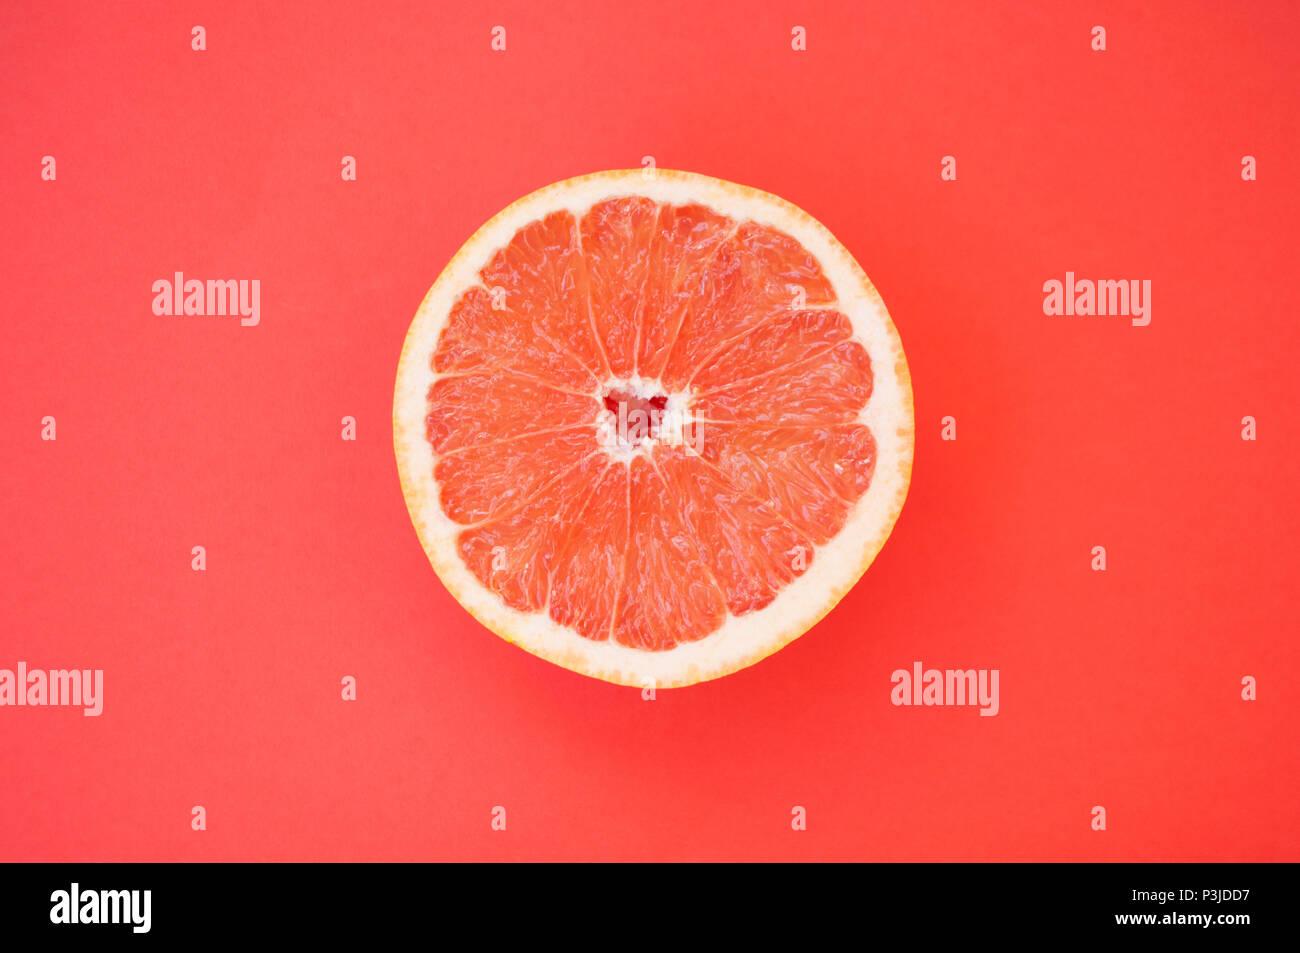 Beautiful juicy cut grapefruit on red background. Stock Photo